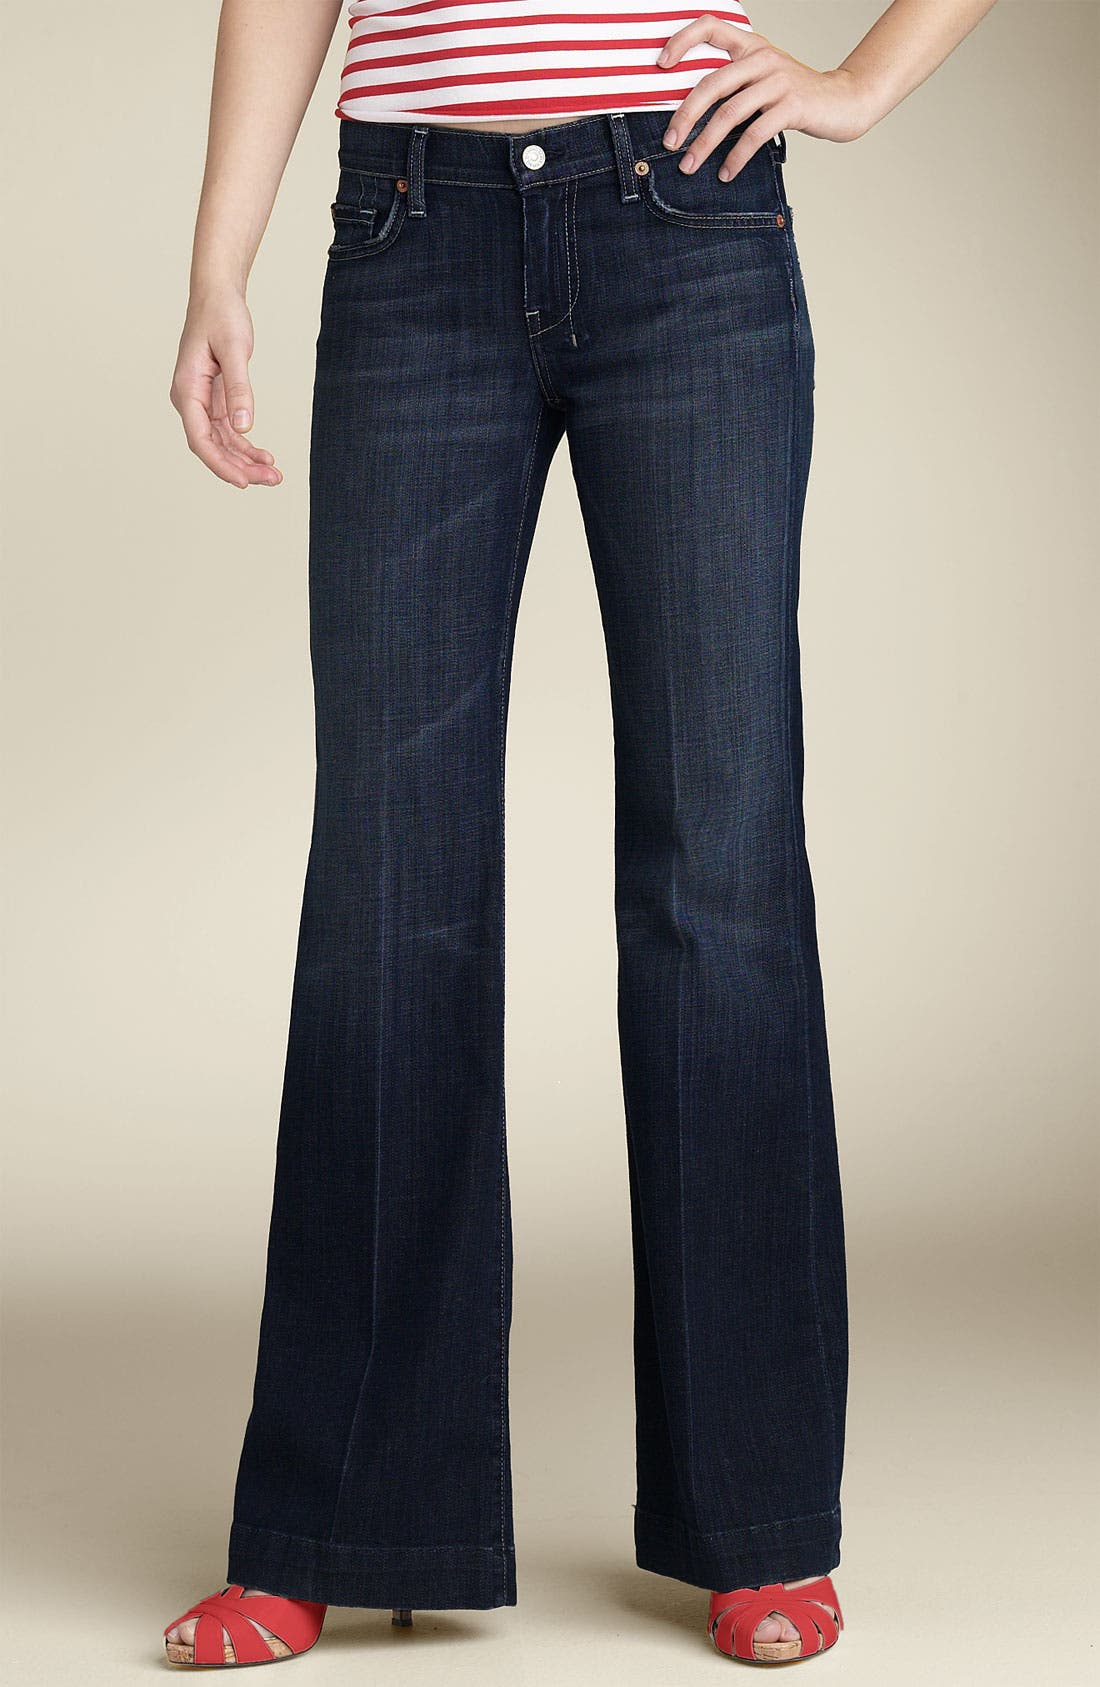 'Dojo' Stretch Trouser Jeans,                             Alternate thumbnail 2, color,                             499